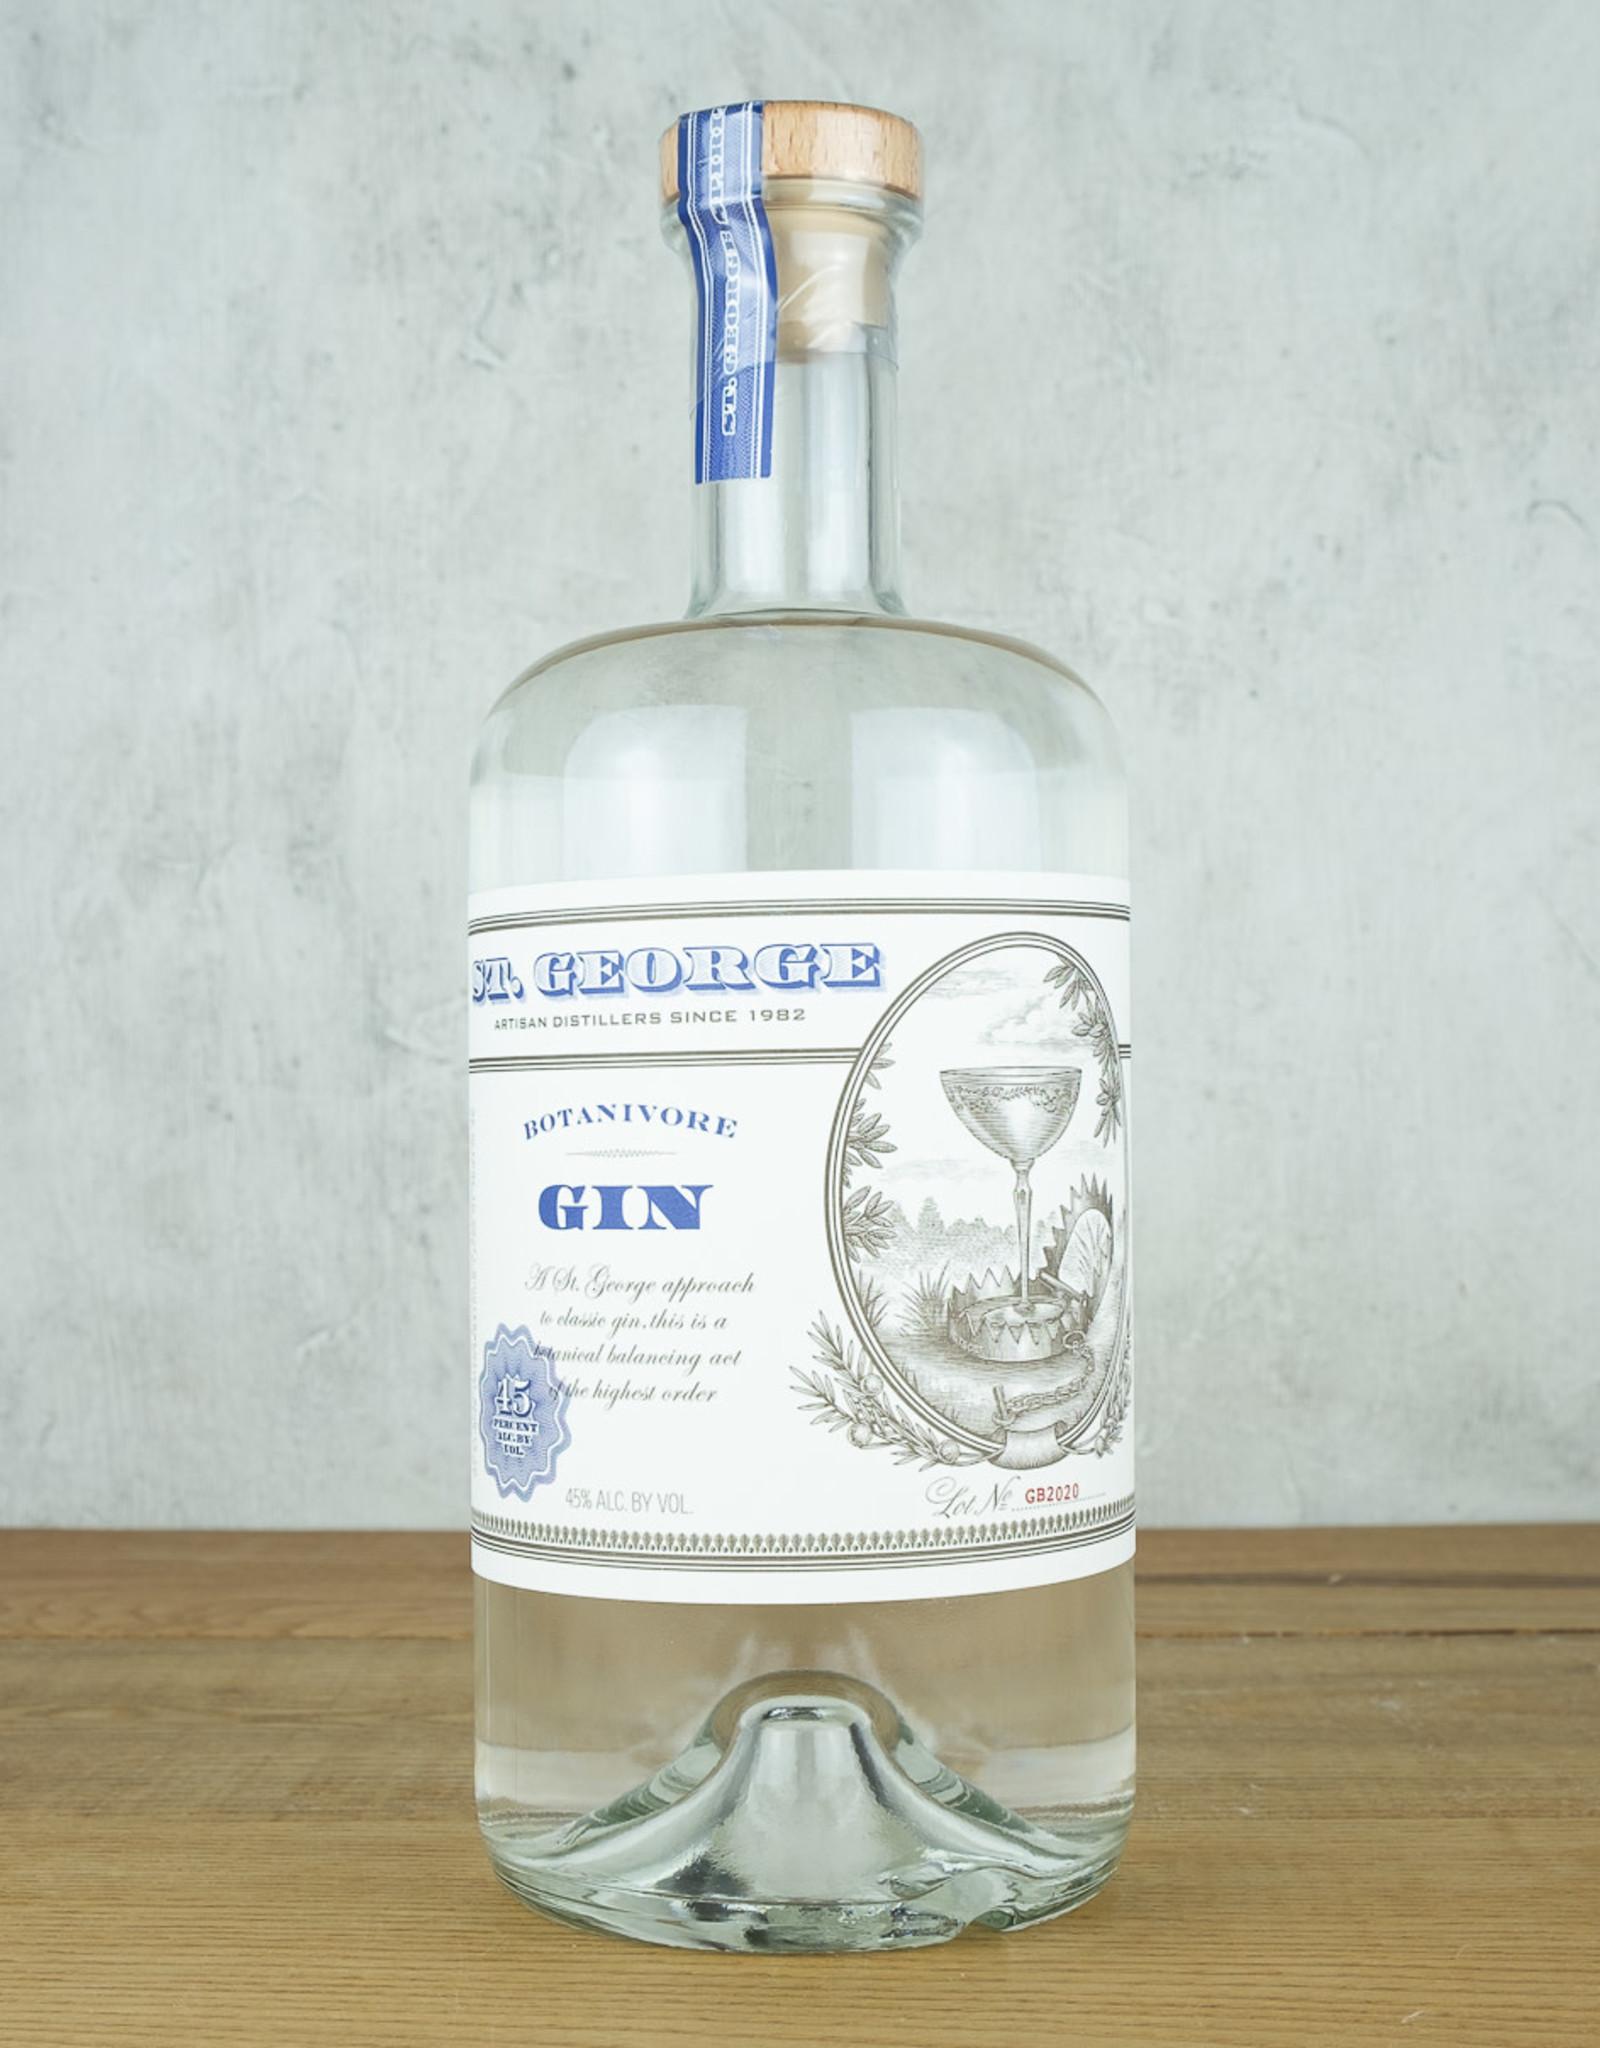 St George Botanivore Gin